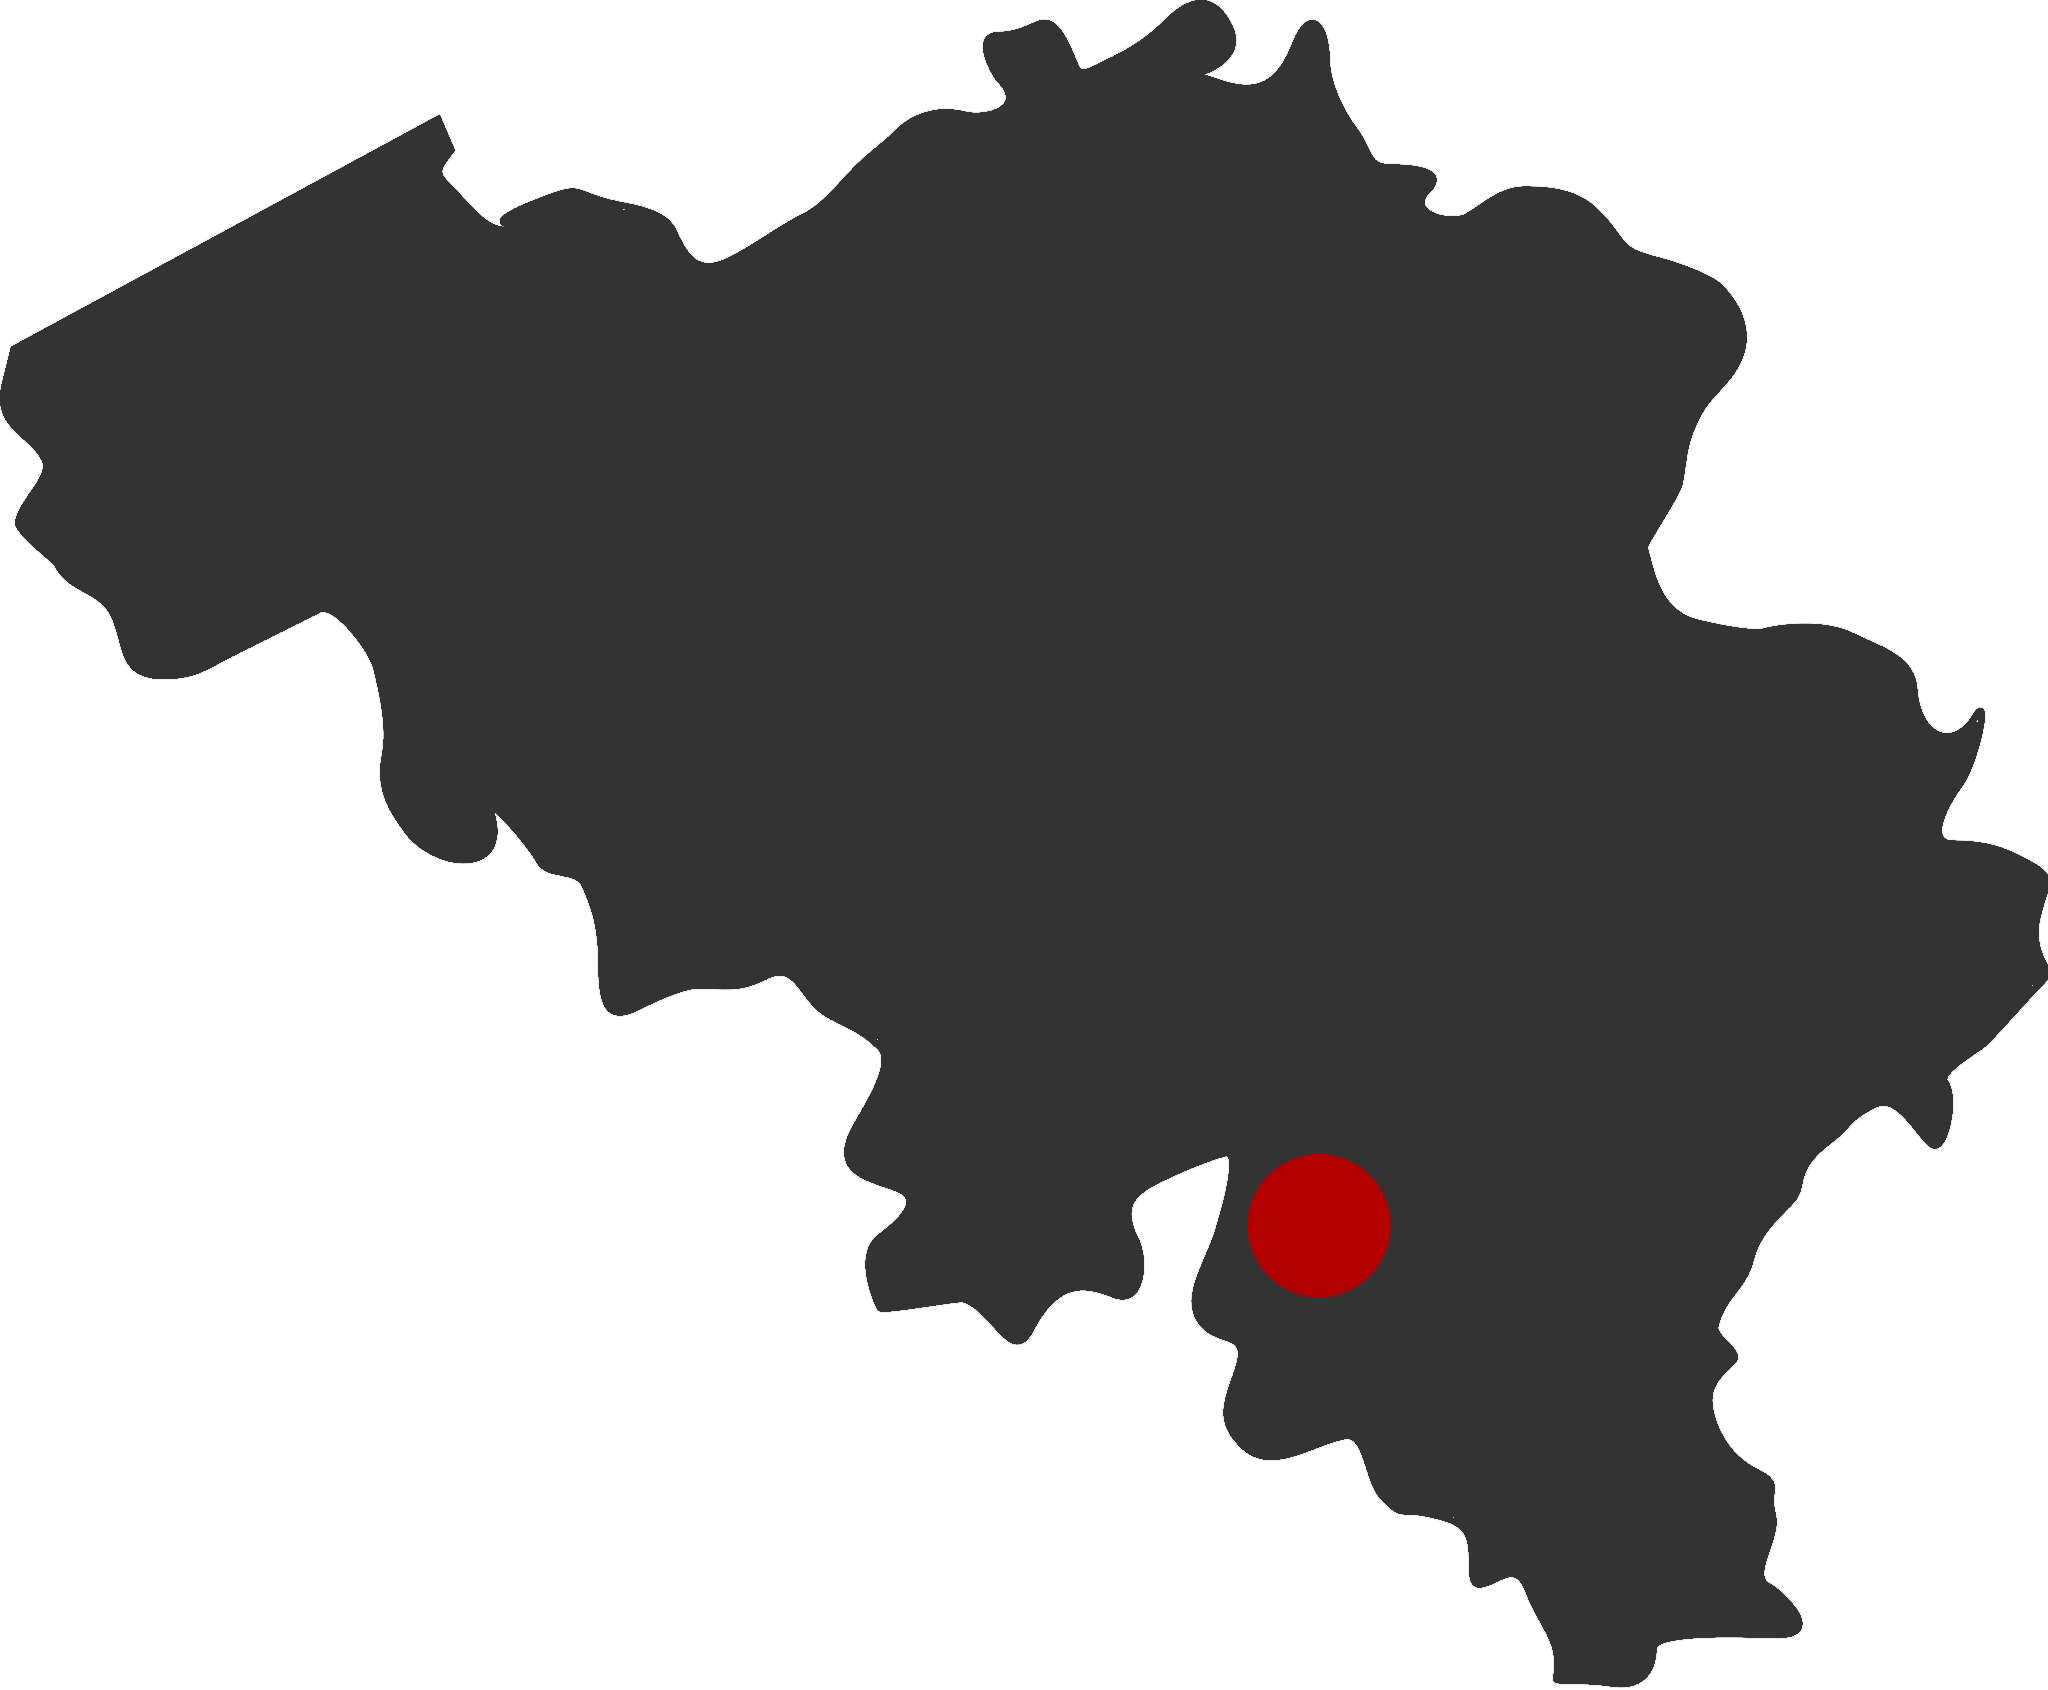 carte-belgique-situation-beauraing